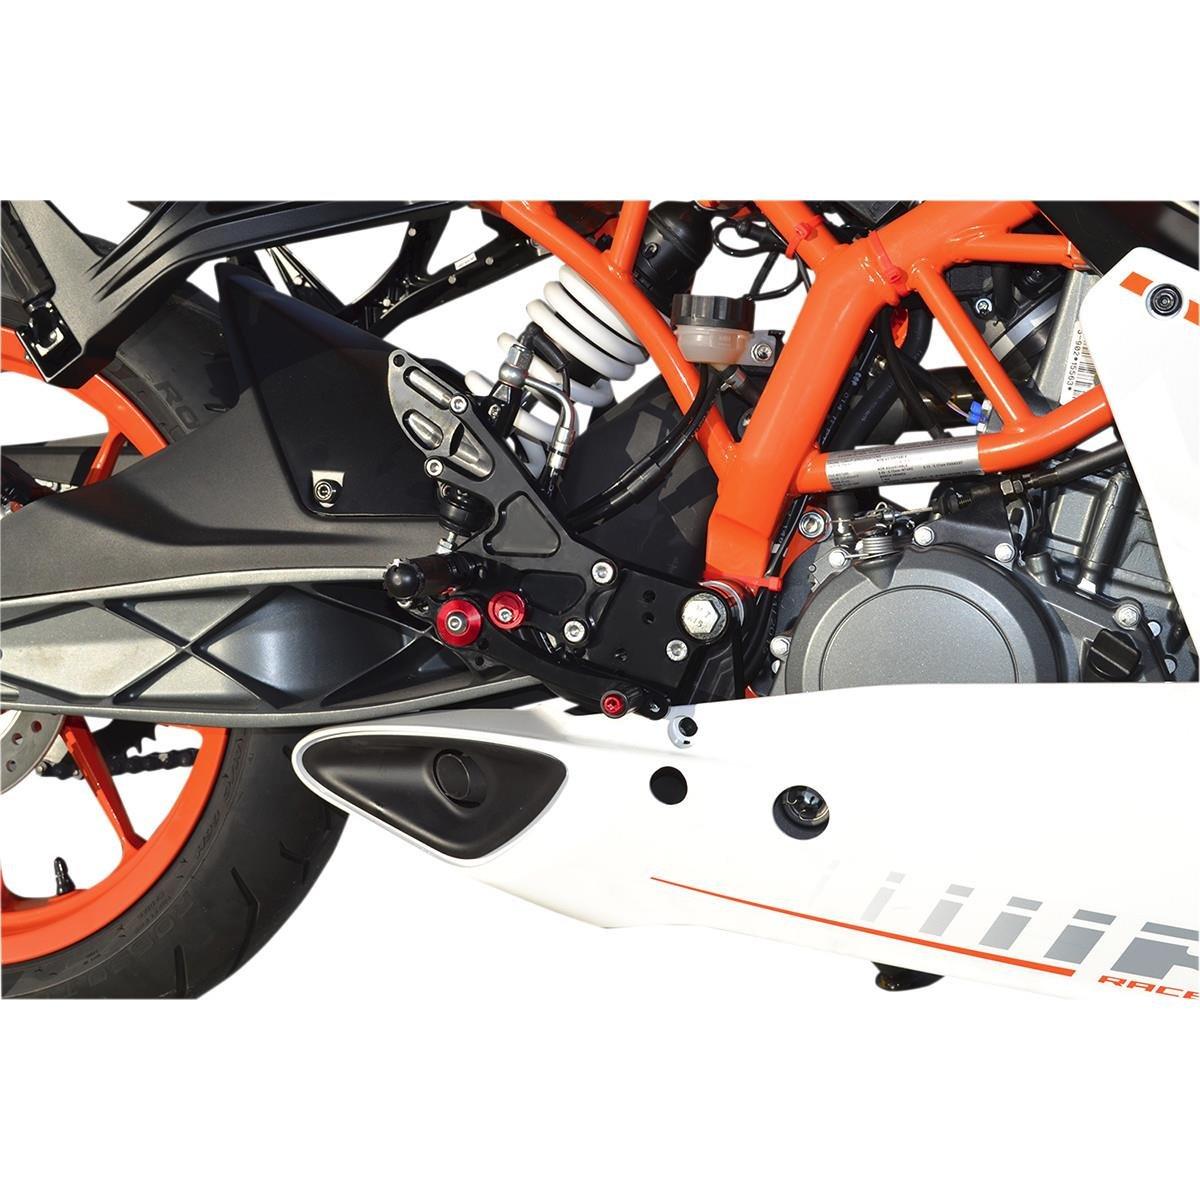 Hotbodies Racing 91401-2500 Black MGP Rear Set (KTM RC 390 (non-cup)/ DUKE 390 (14-16')